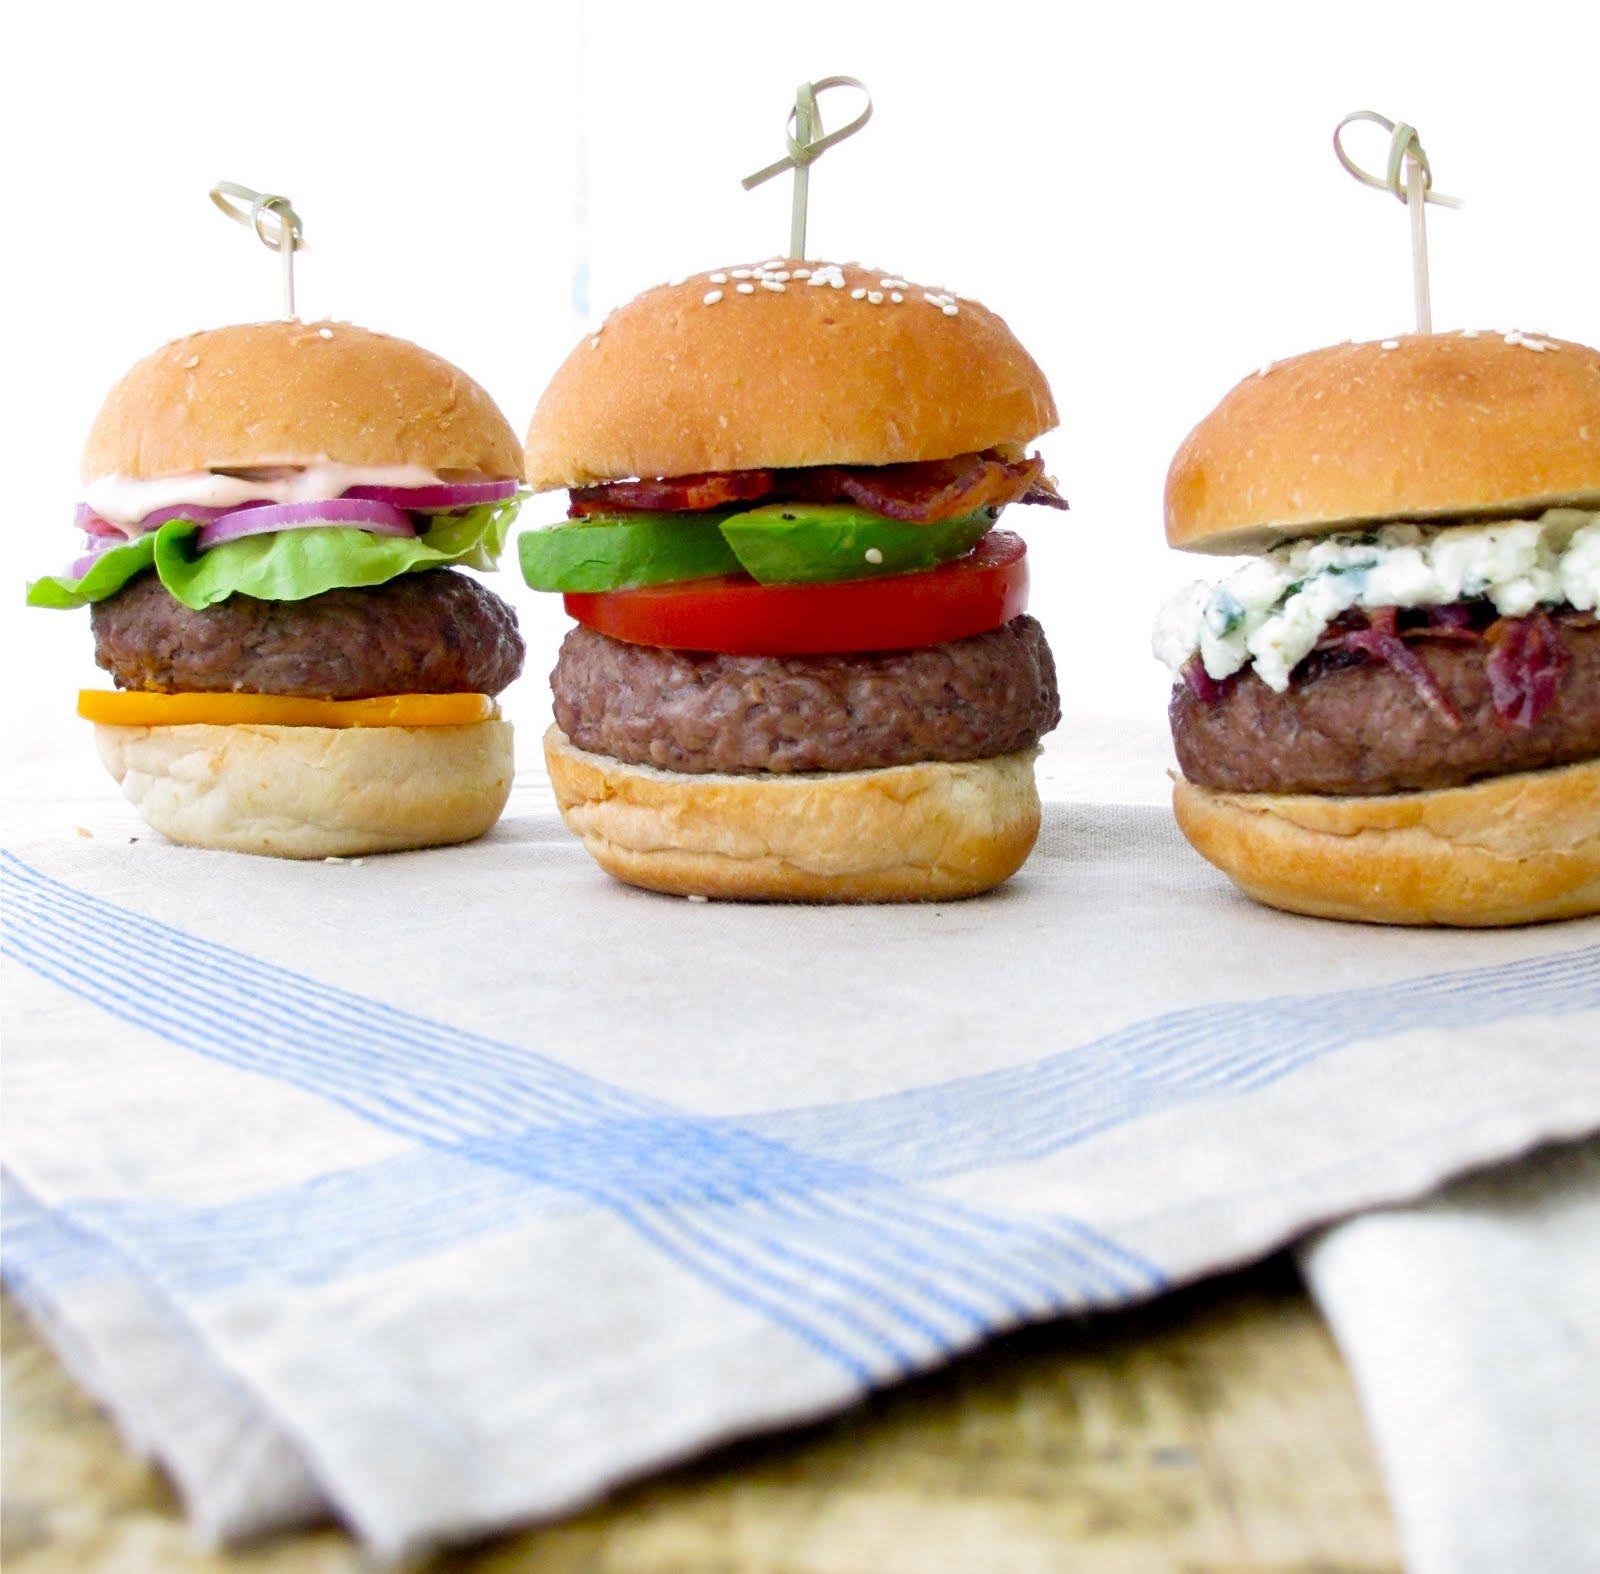 ... : Bacon Avocado & Tomato Burgers with Blue Cheese | Burgers & Sli...